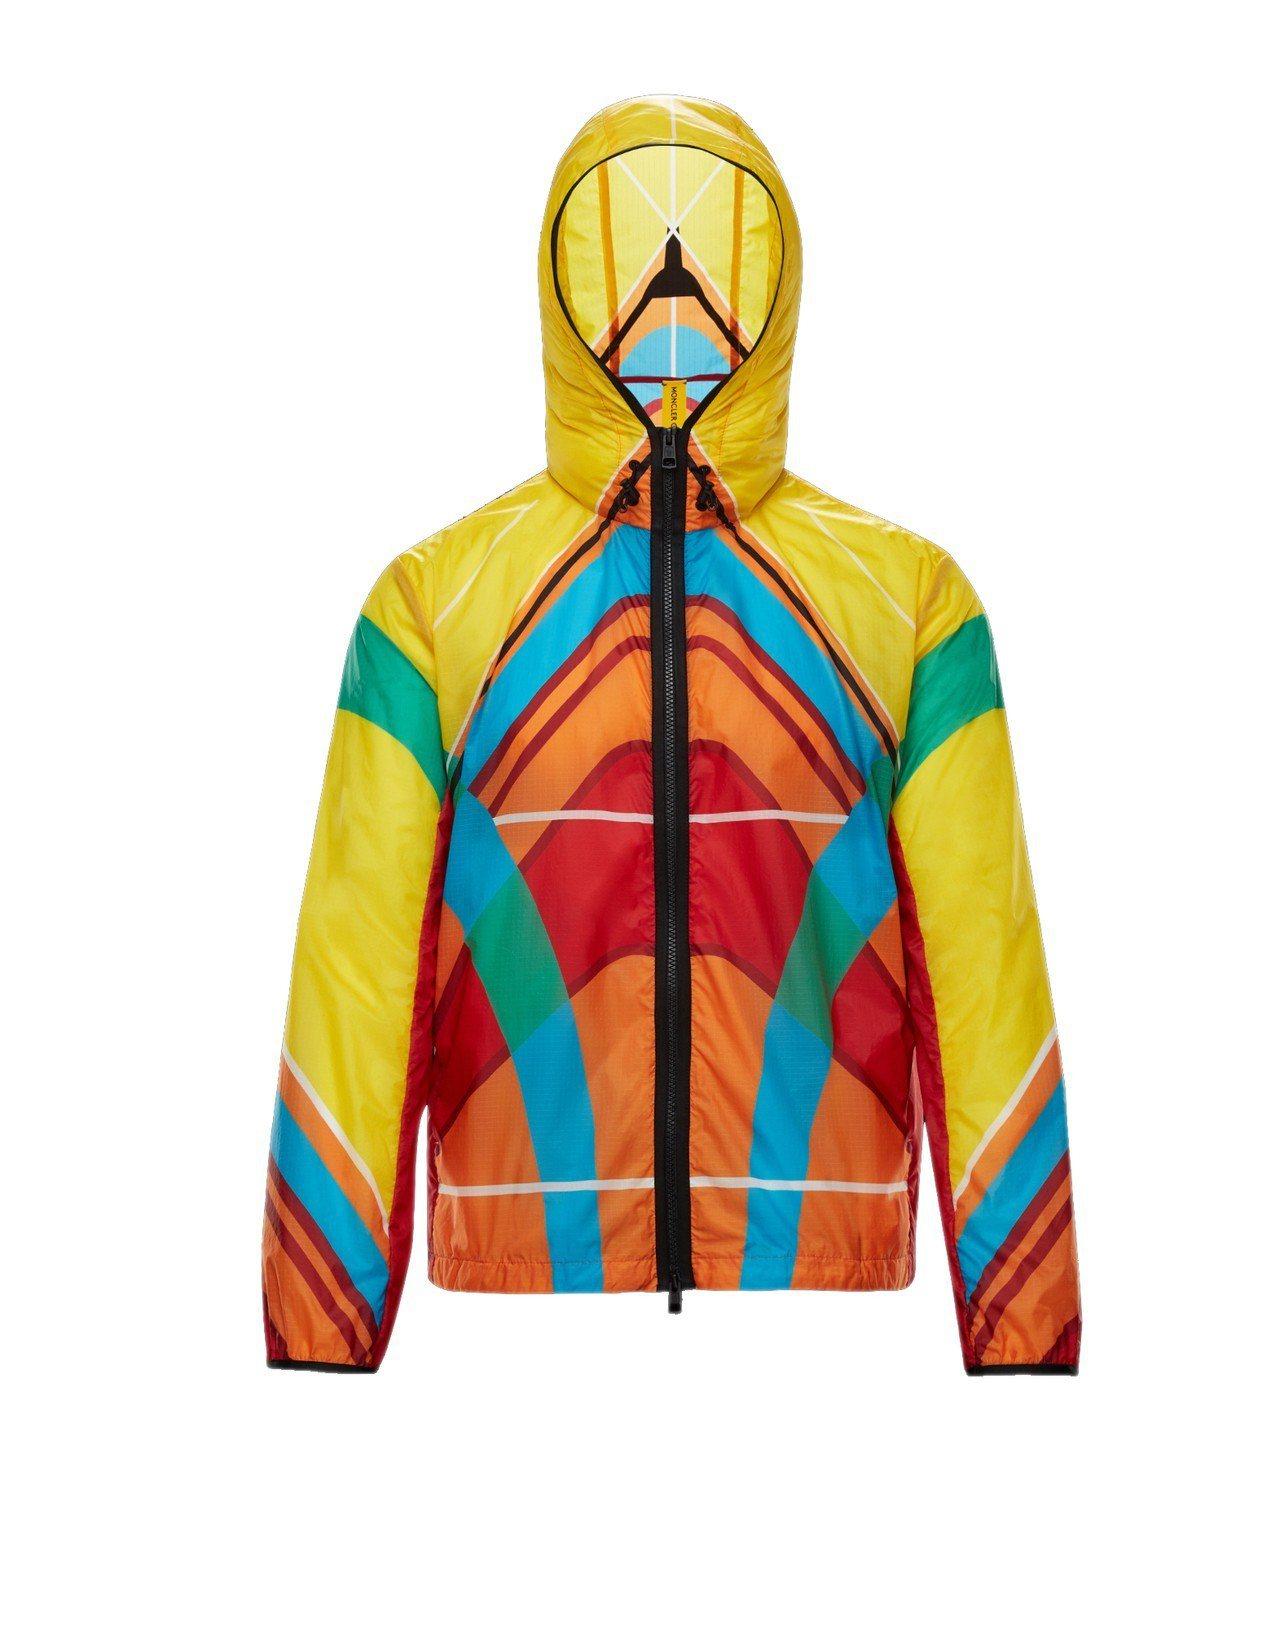 Spinner多彩撞色外套,售價56,700元。圖/MONCLER提供